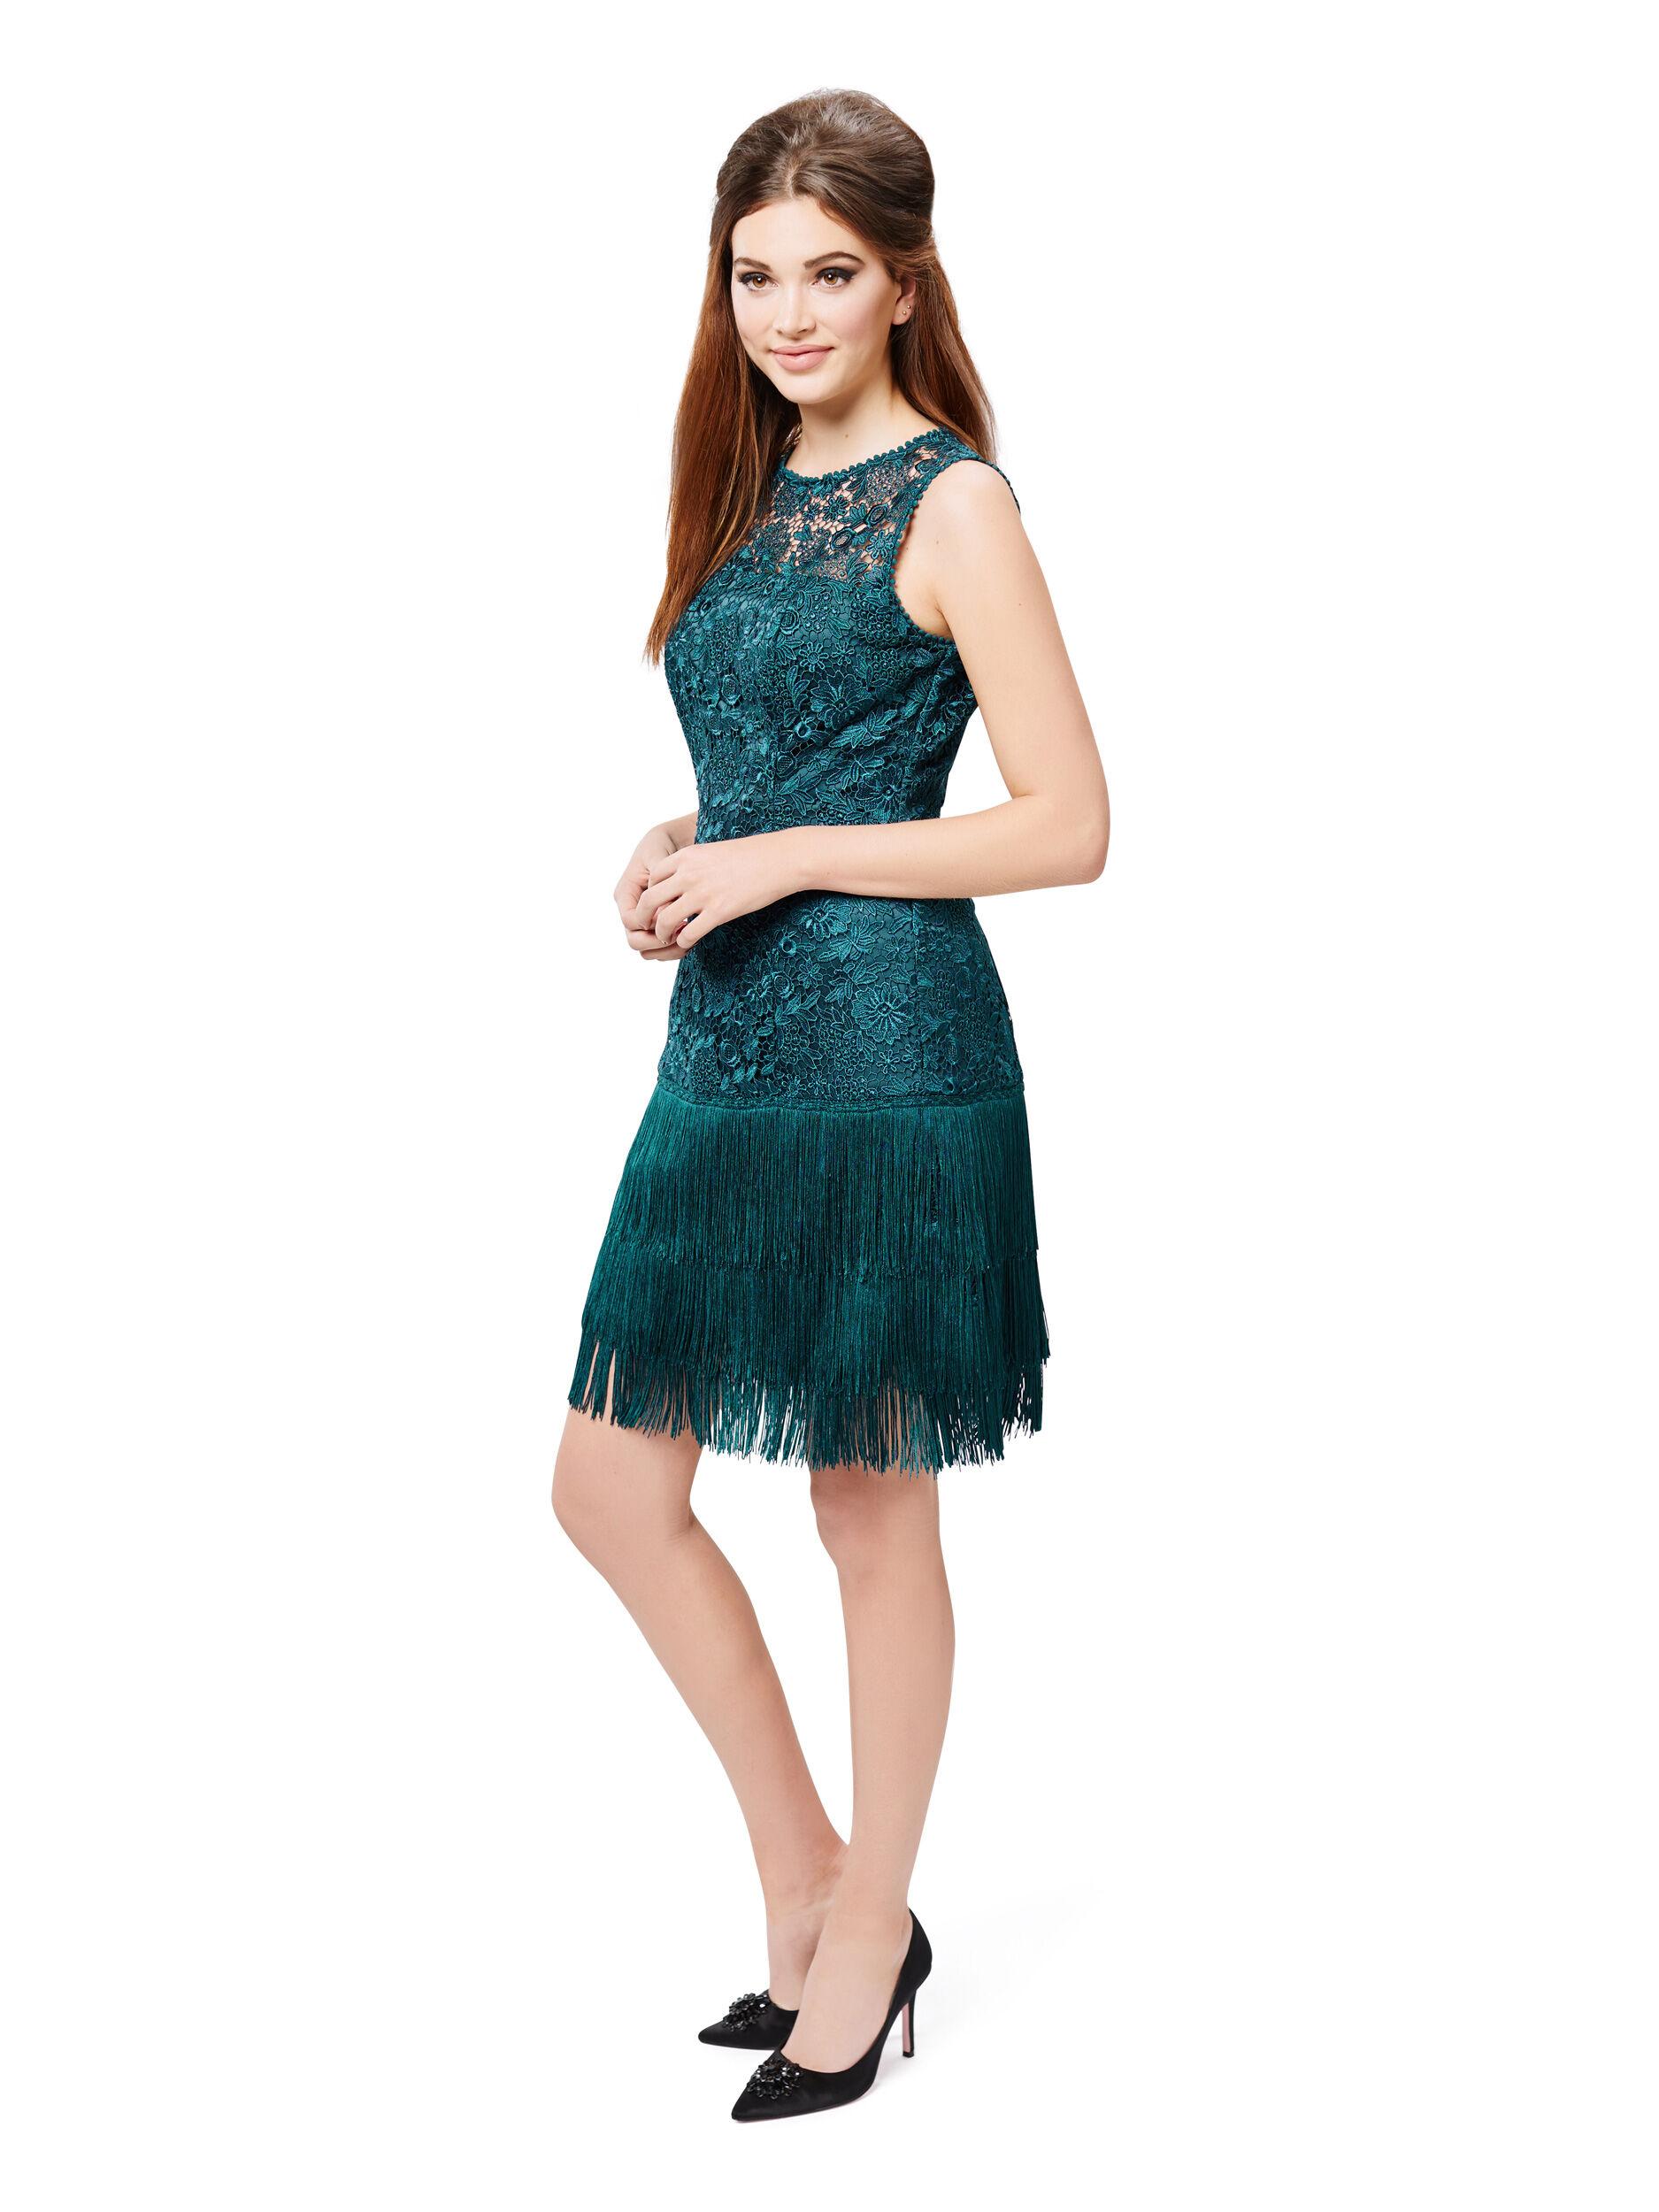 Atlanta Dress